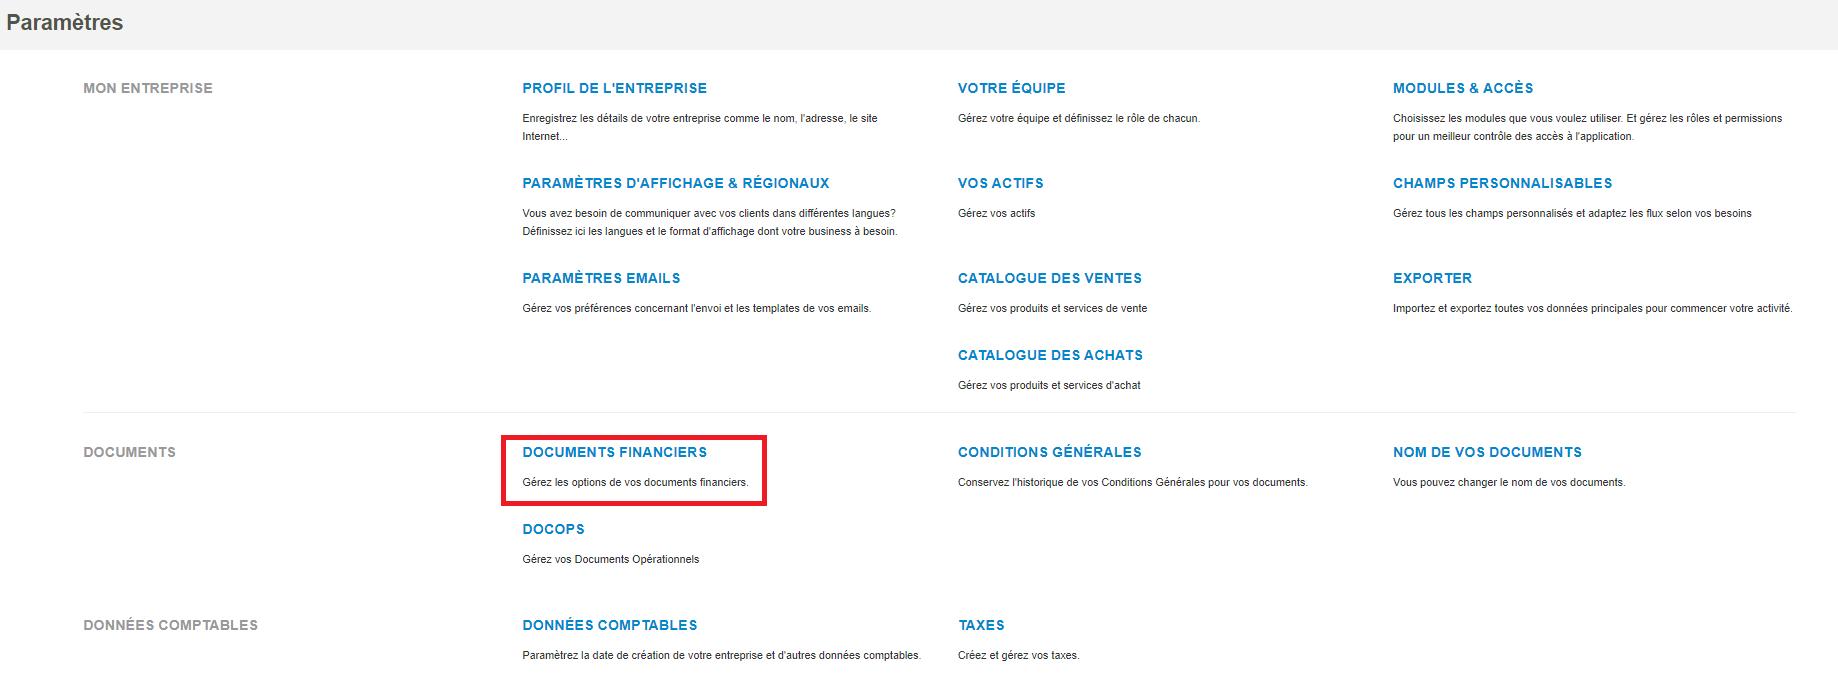 Smoall-Paramètres-Documents financiers